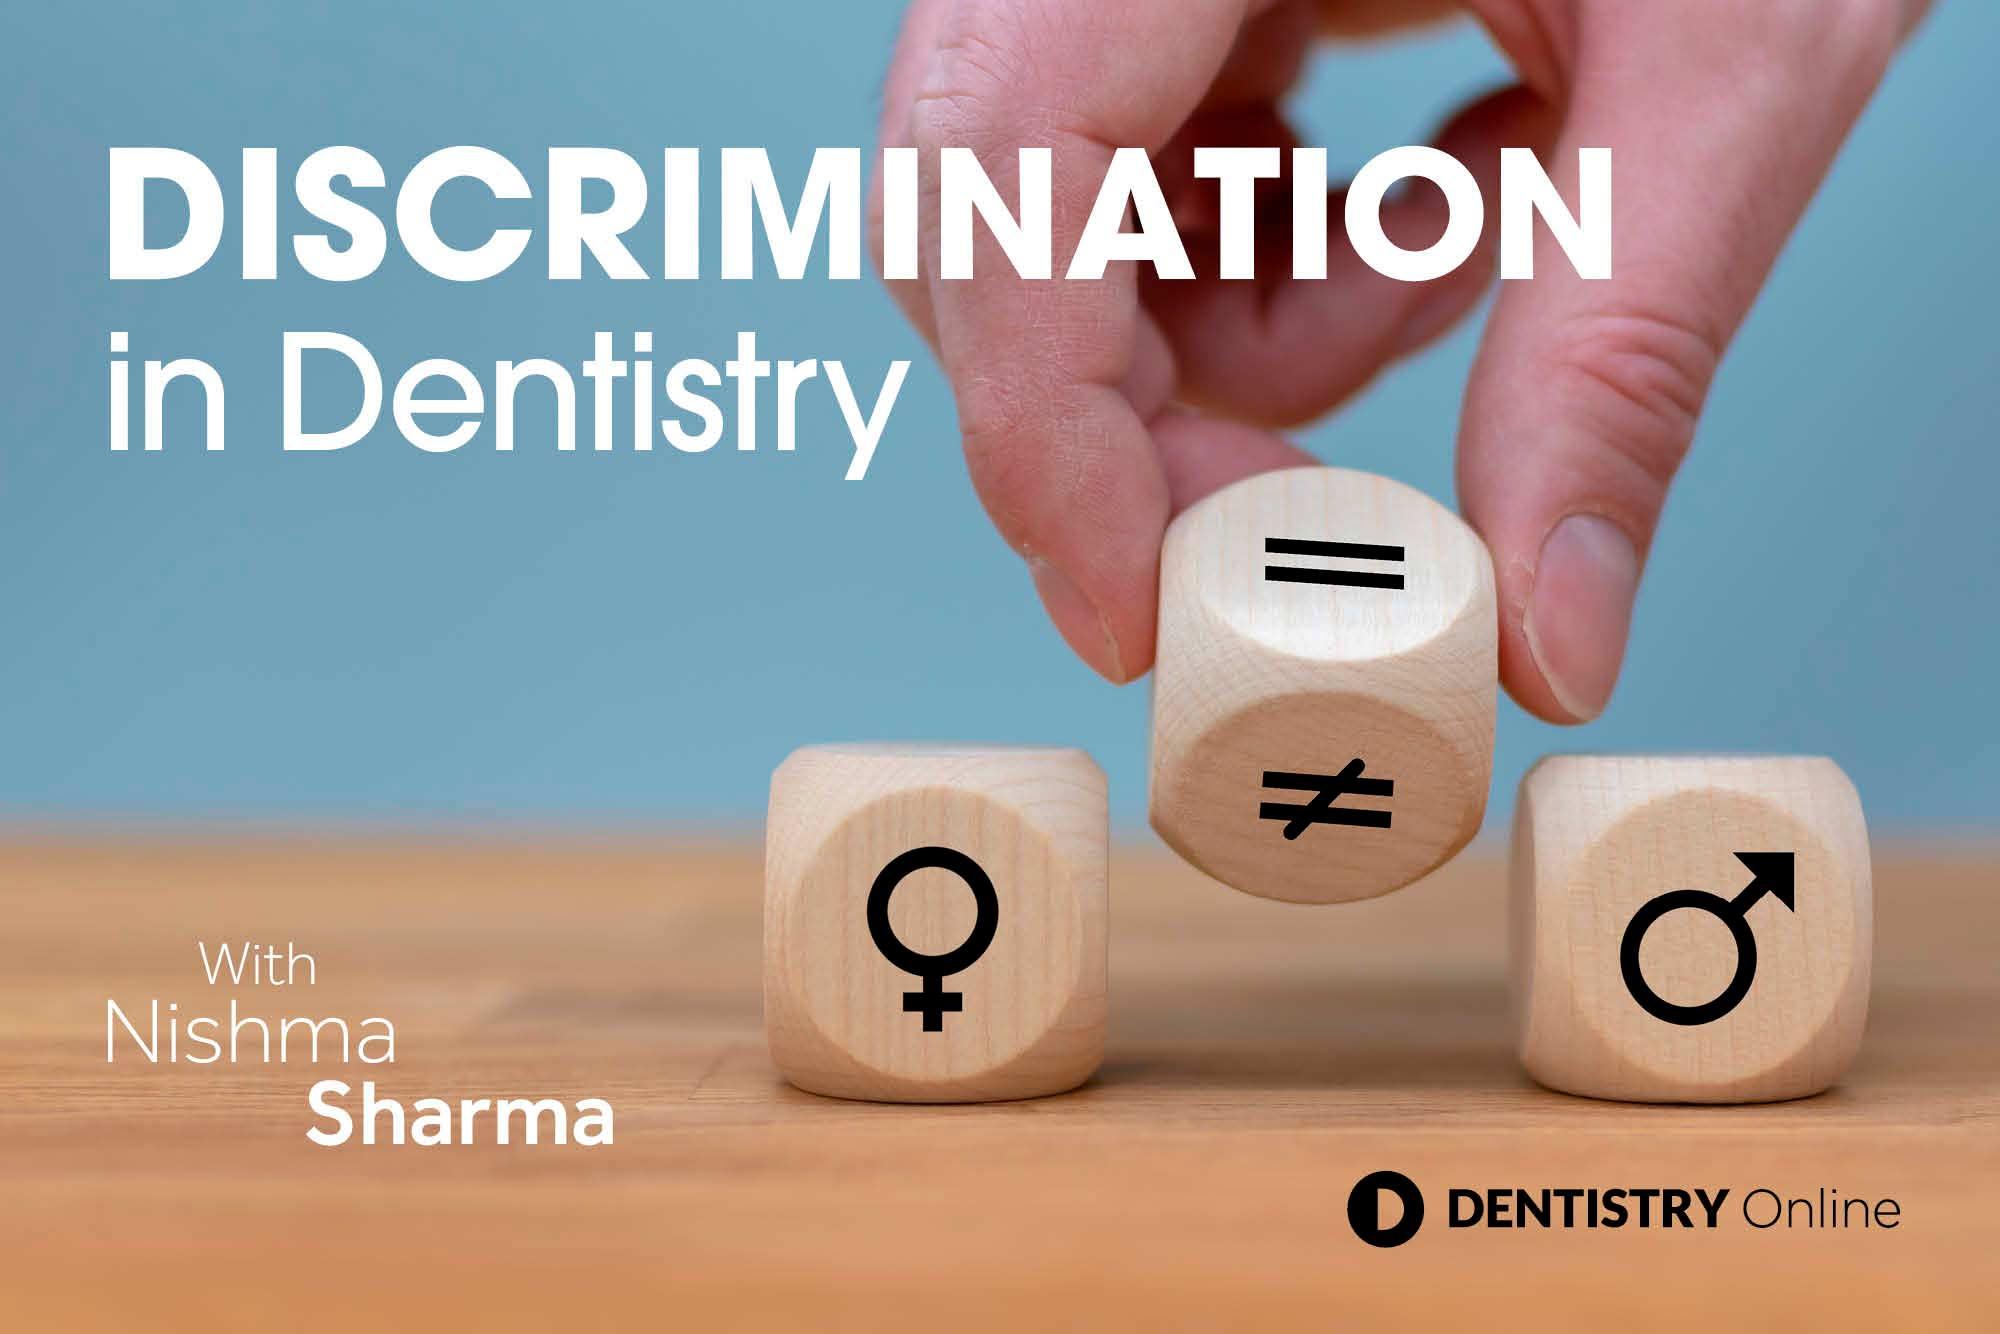 Discrimination in Dentistry